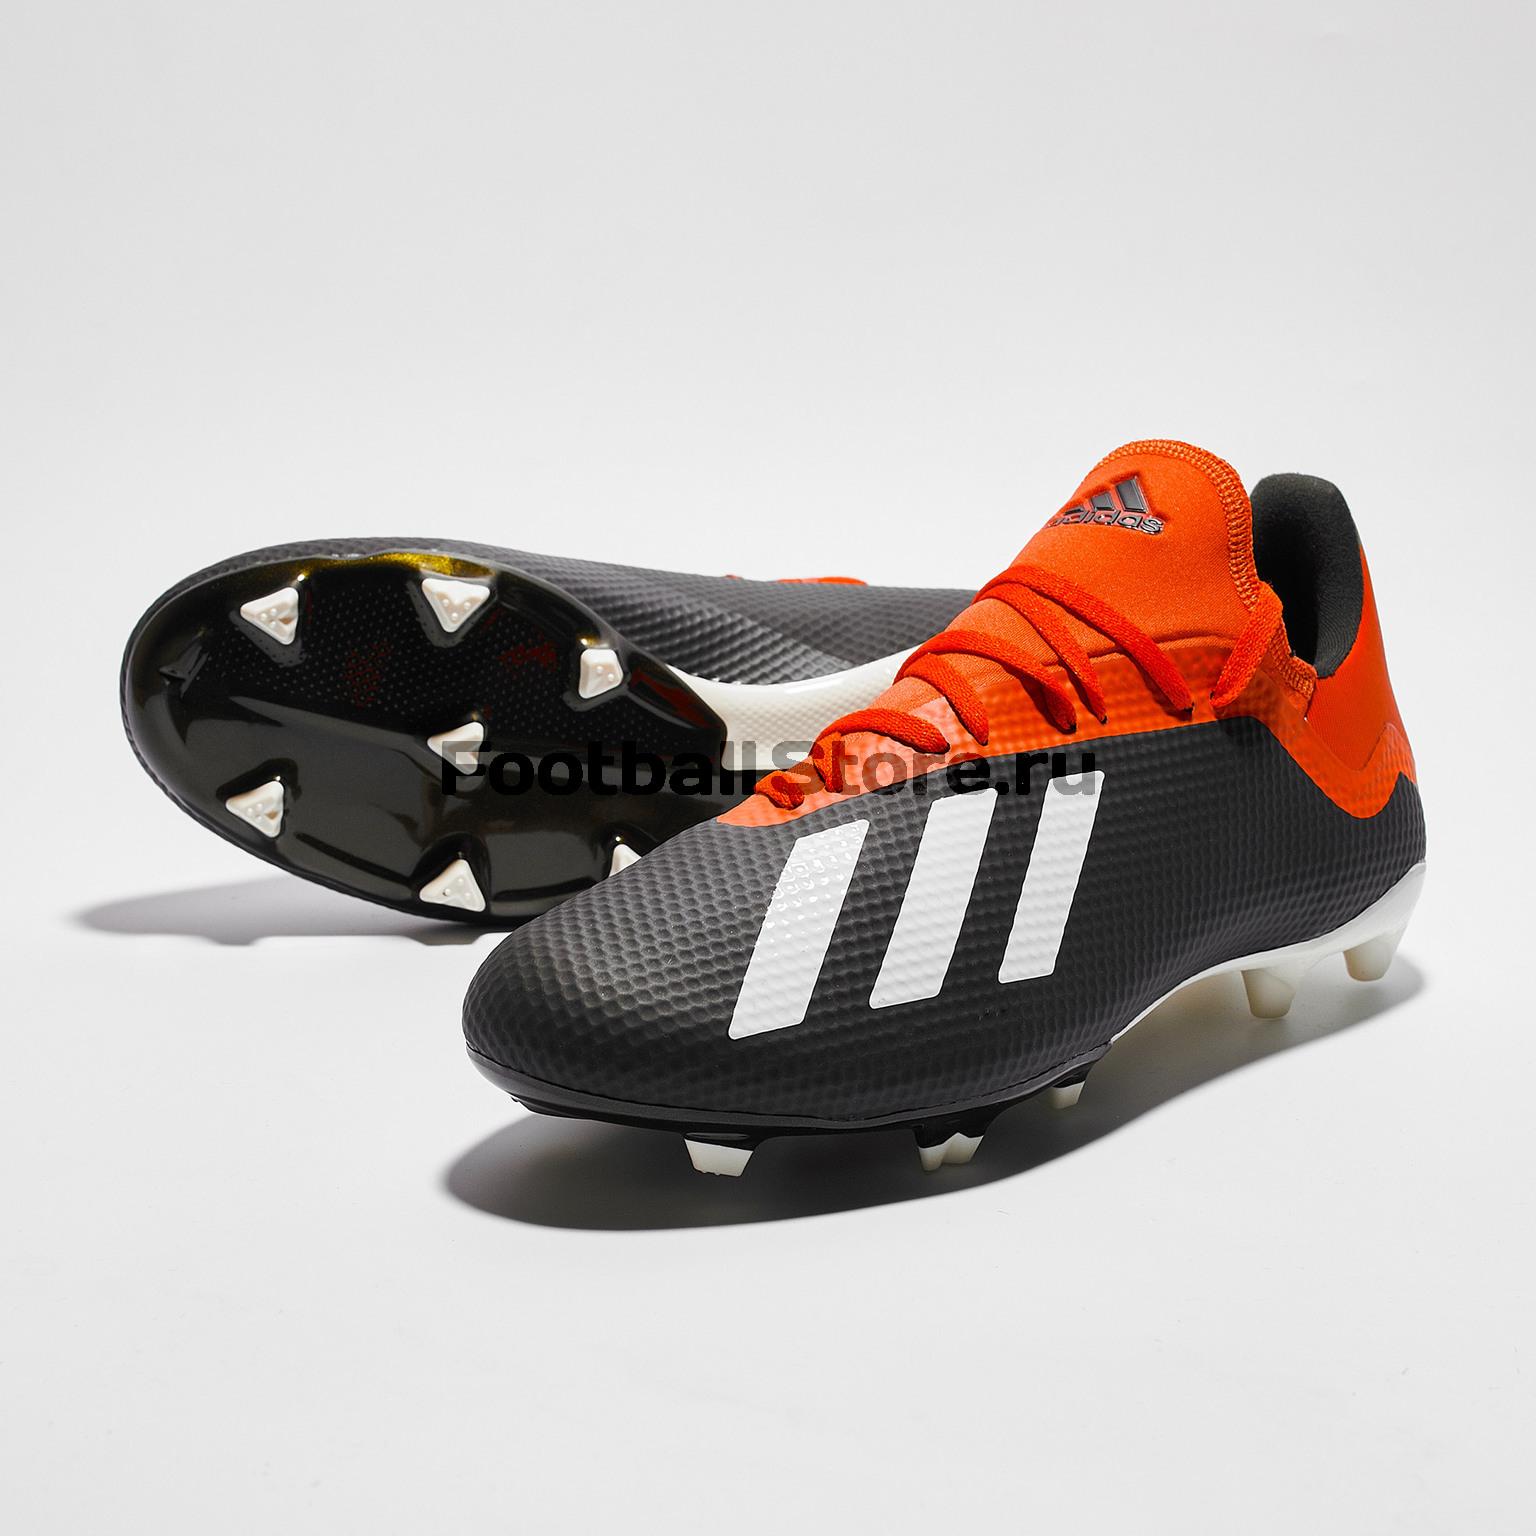 Бутсы Adidas X 18.3 FG BB9366